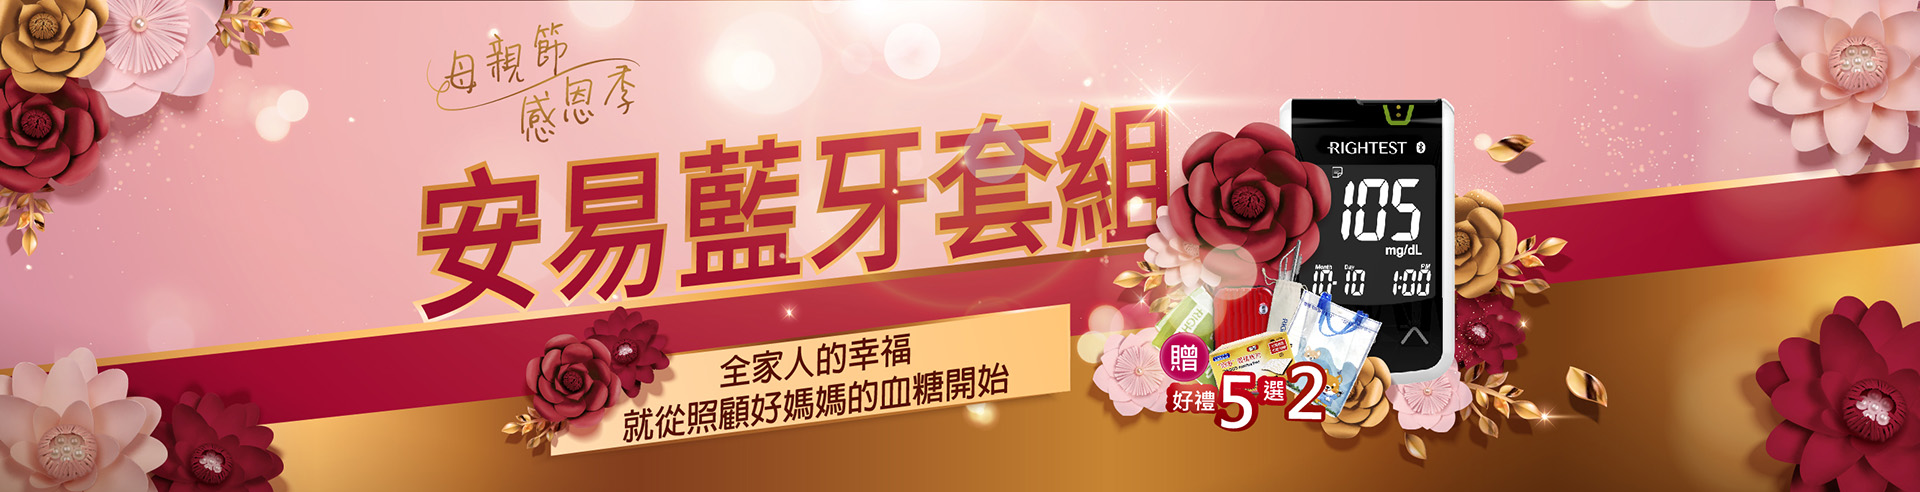 proimages/banner/母親節感恩季.jpg